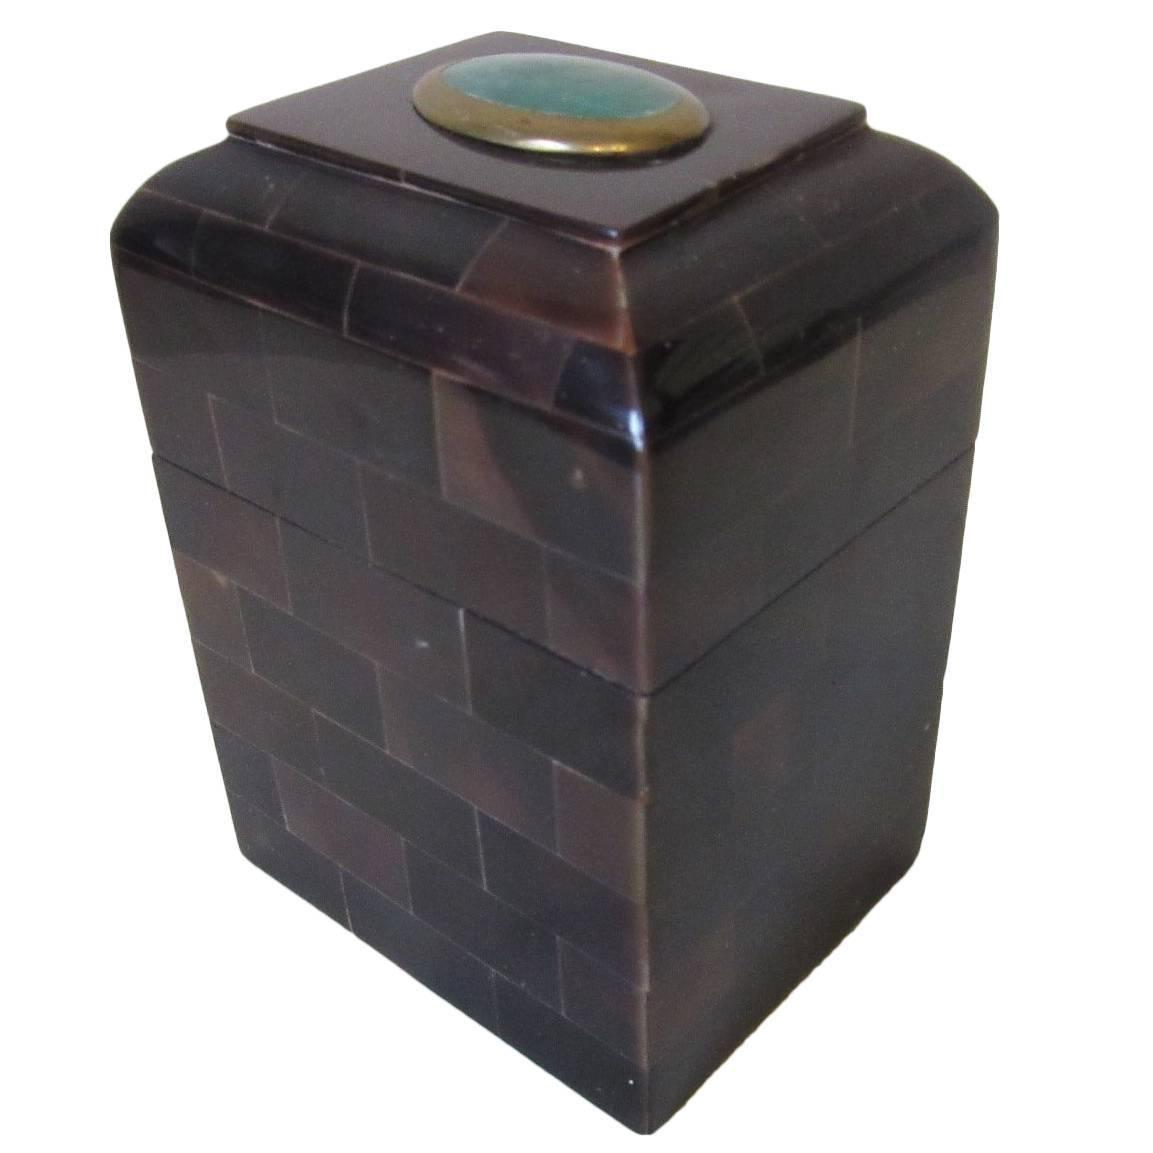 Maitland Smith Tessellated Horn and Gem Stone Decorative Box